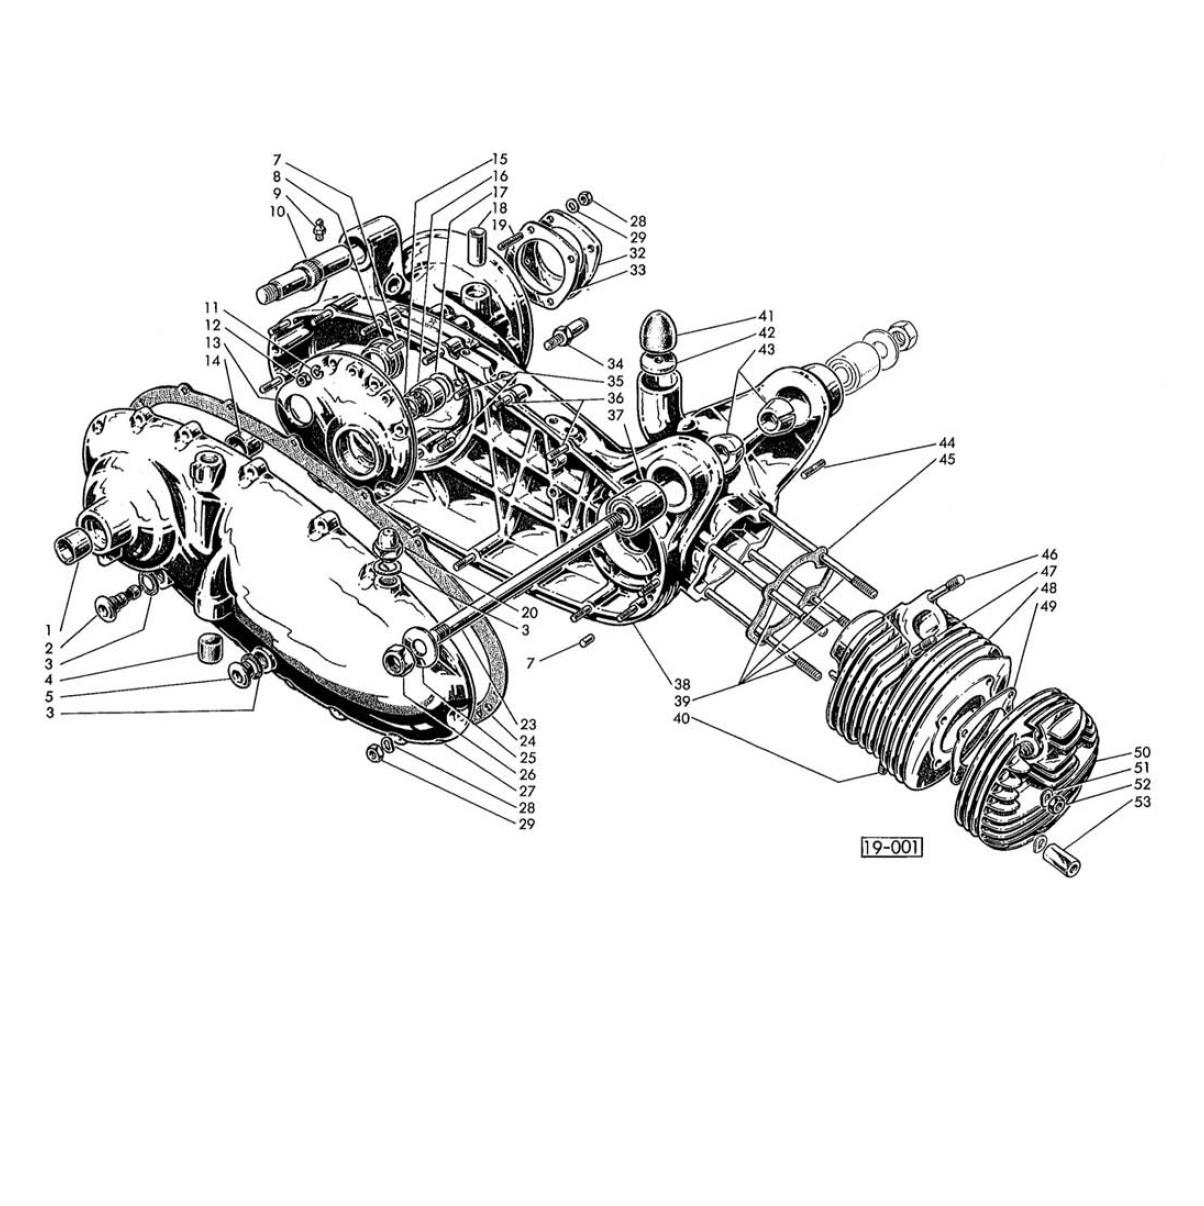 Carter Motore, Cilindro e Testa (Tav.1)